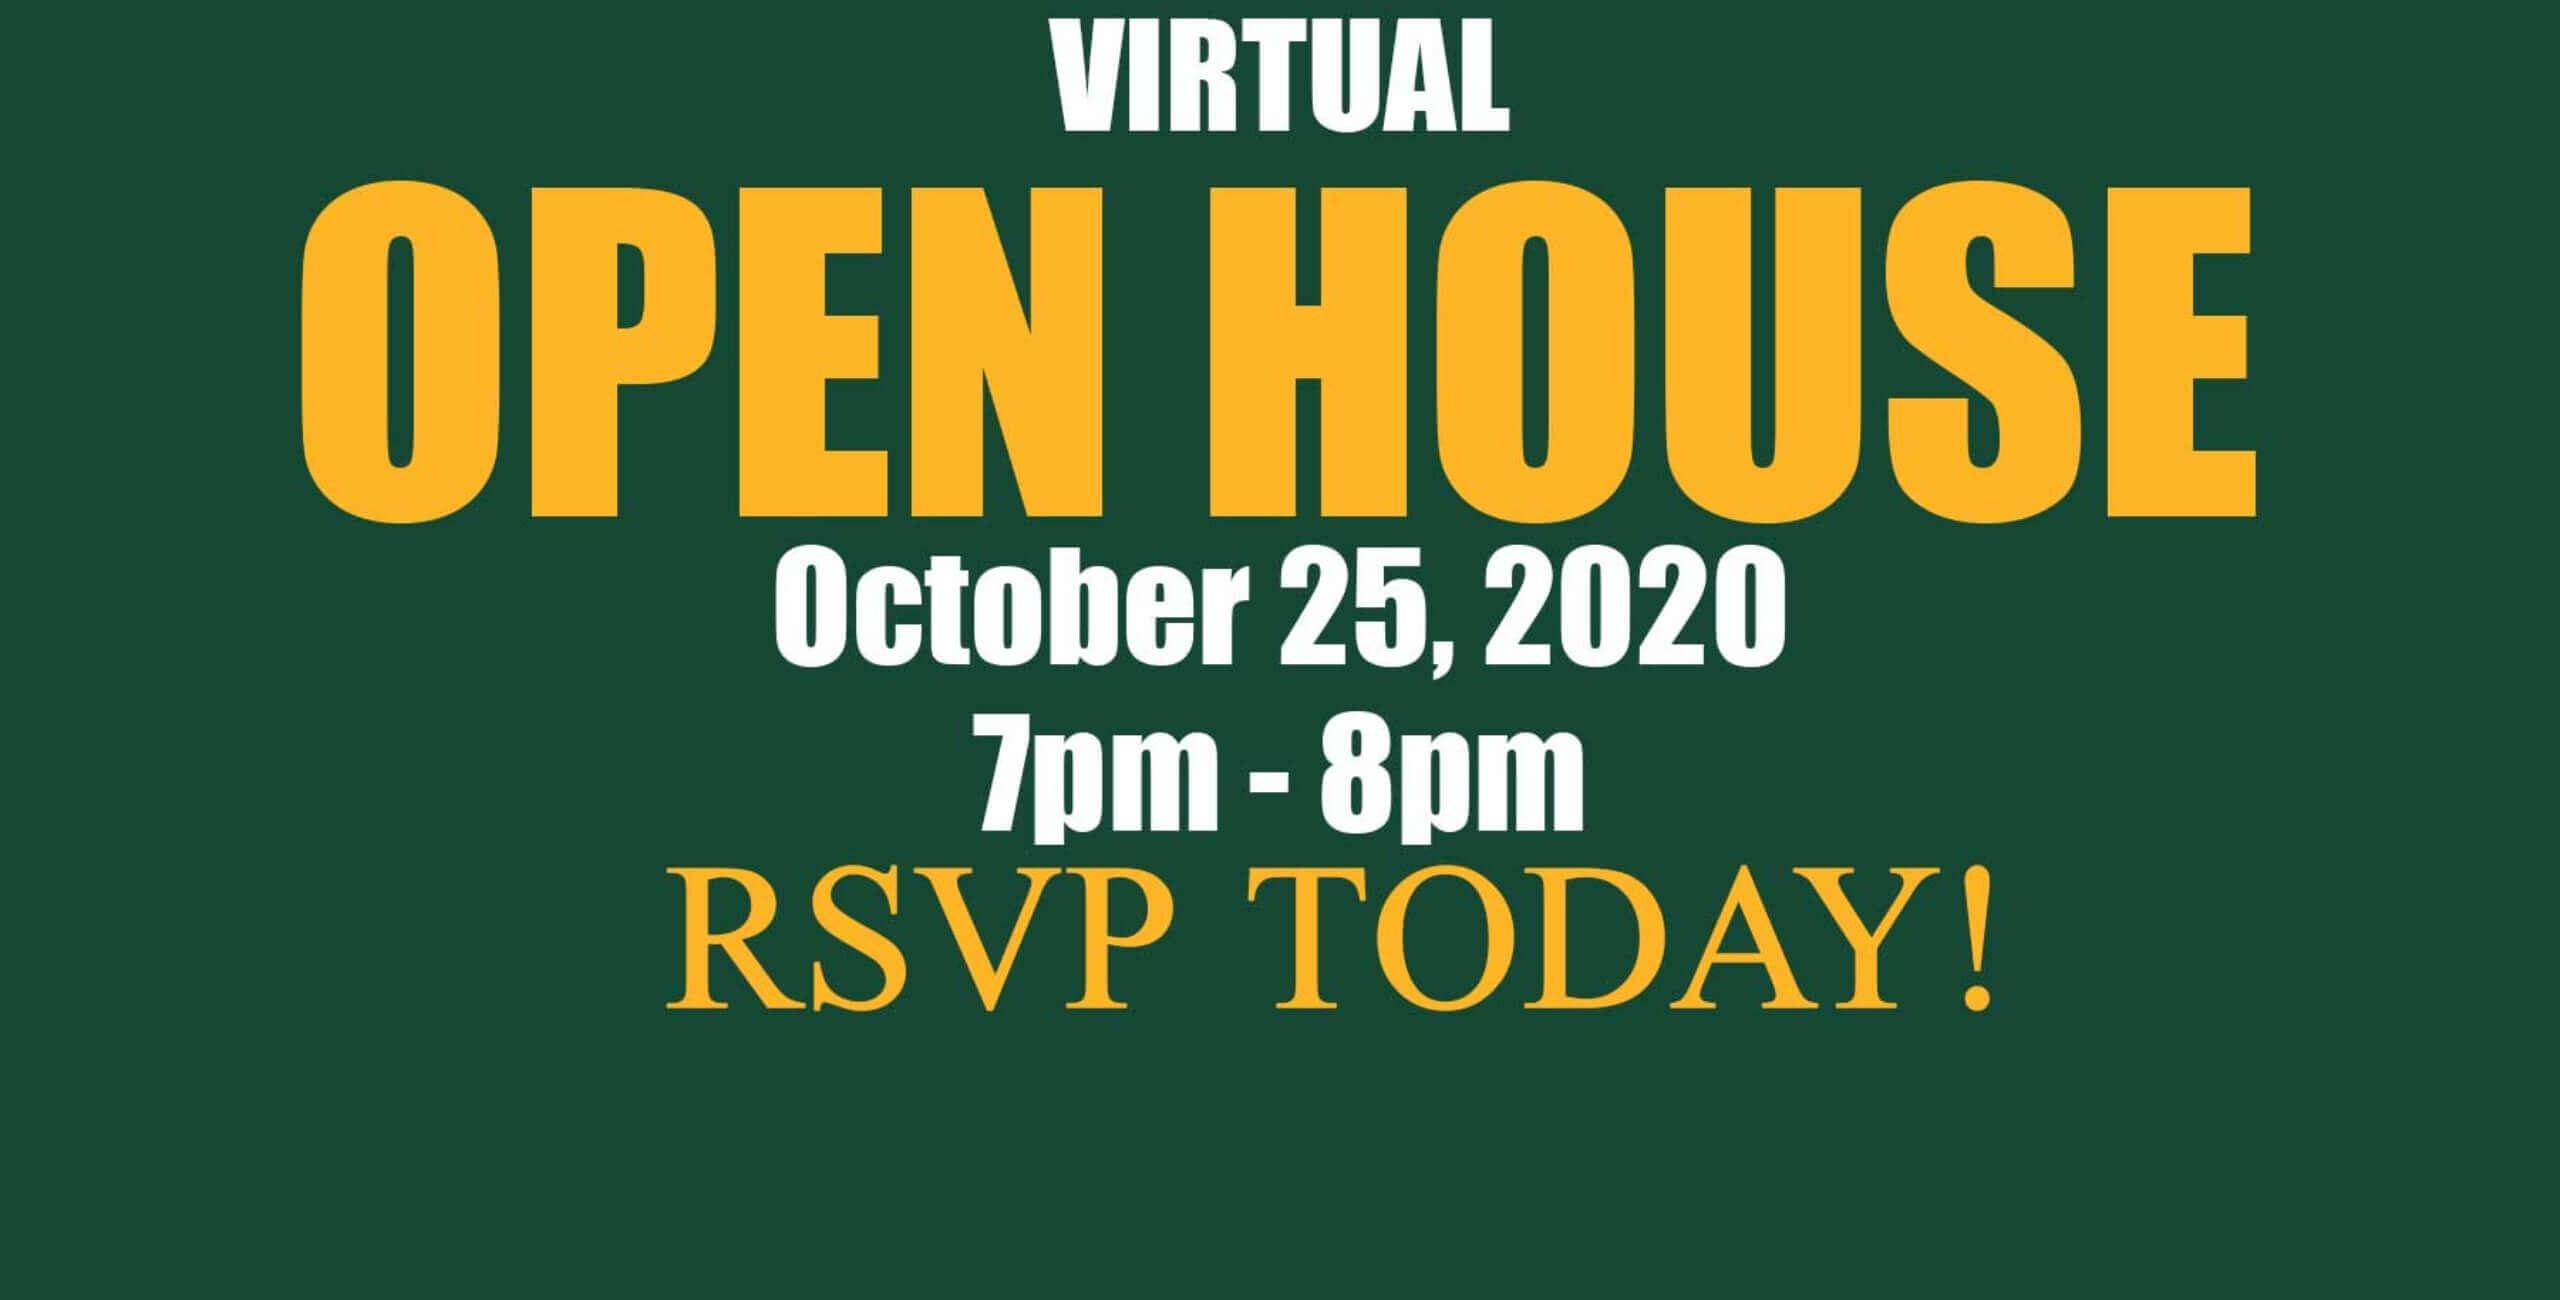 OpenHouse20-virtual